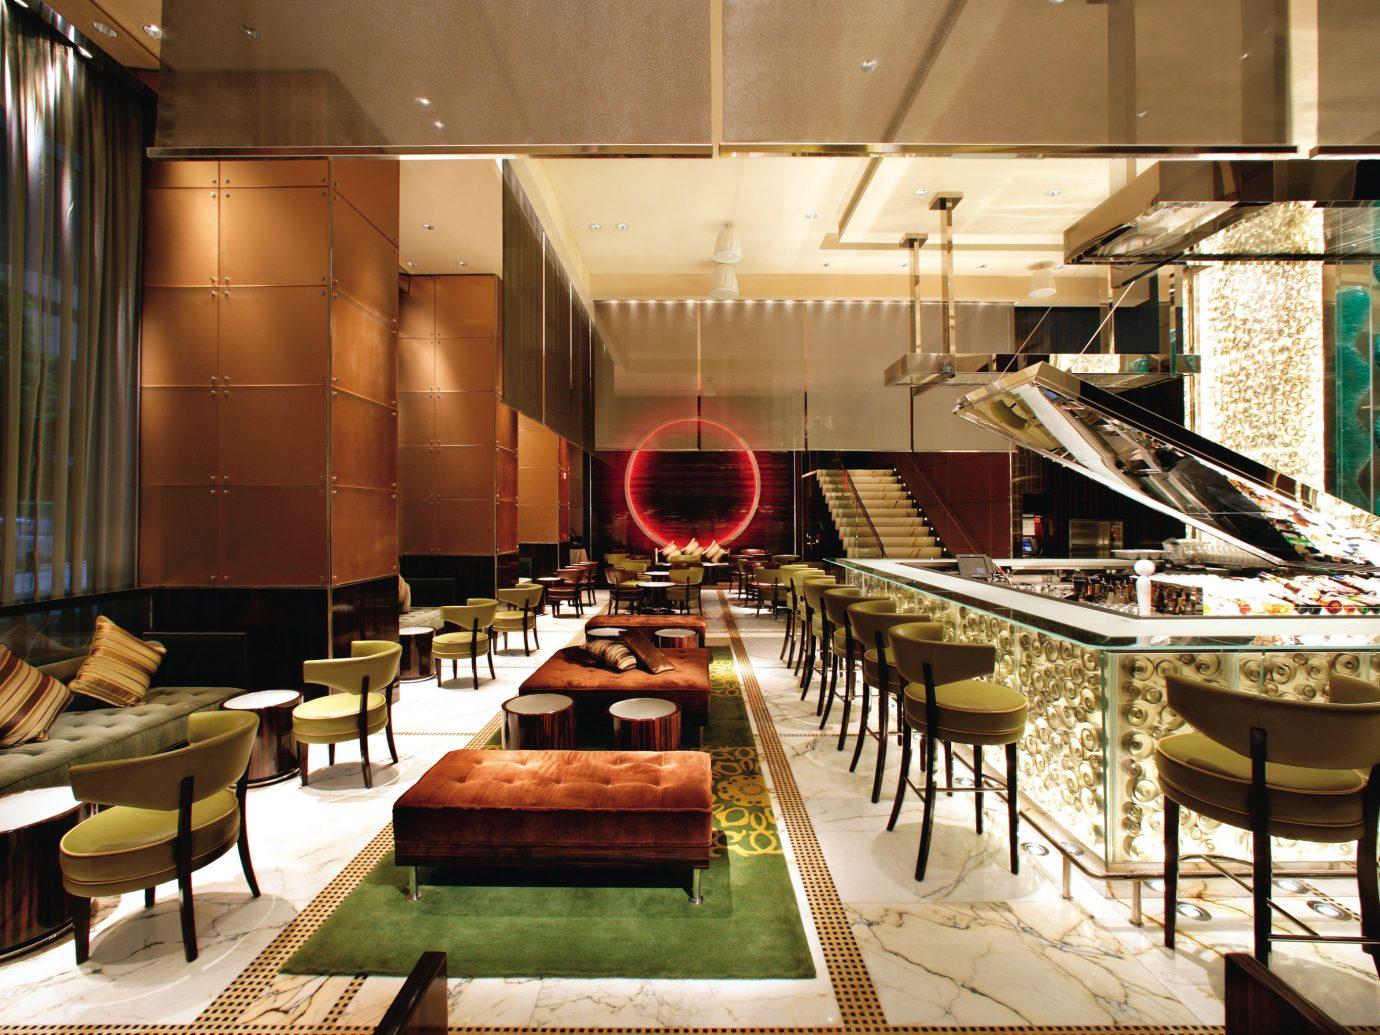 Business City Design Elegant Hotels Luxury table indoor meal restaurant interior design buffet furniture several